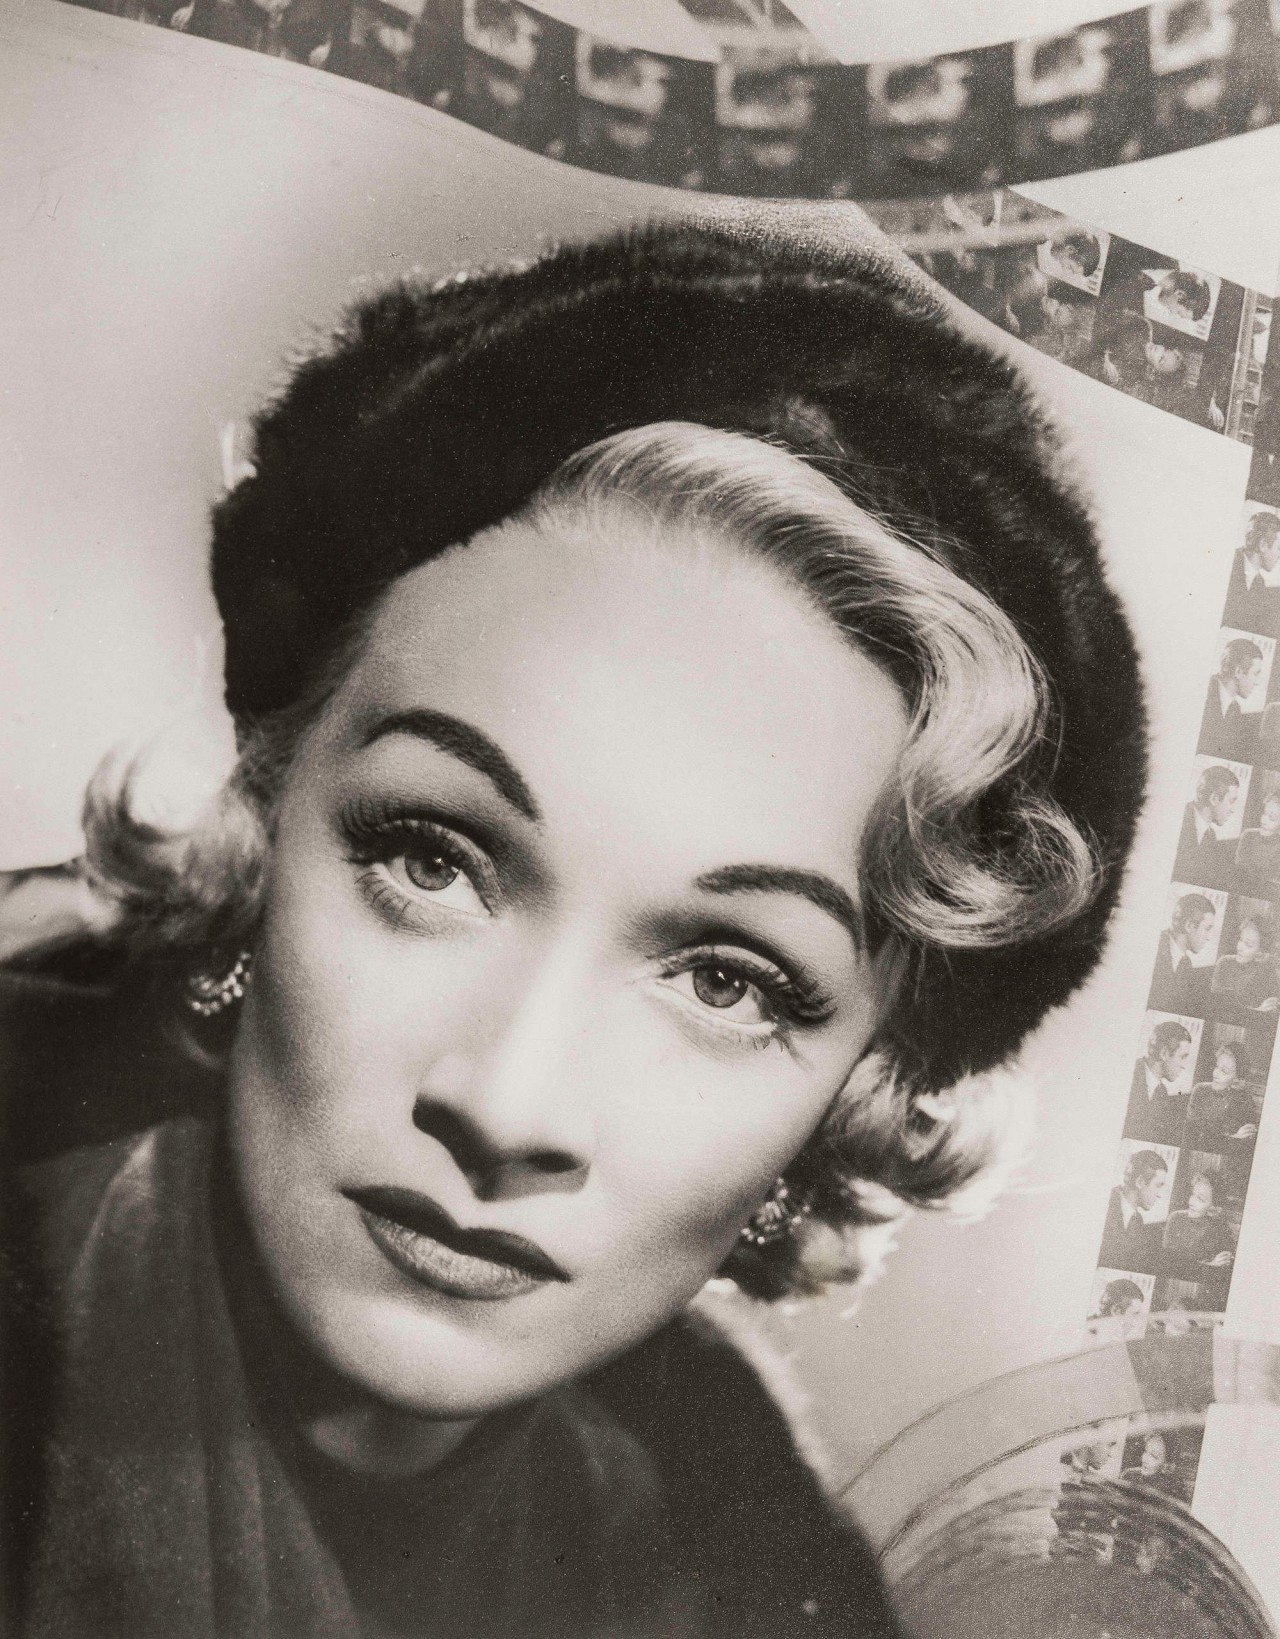 Марлен Дитрих, 1950 год. Ангус МакБин